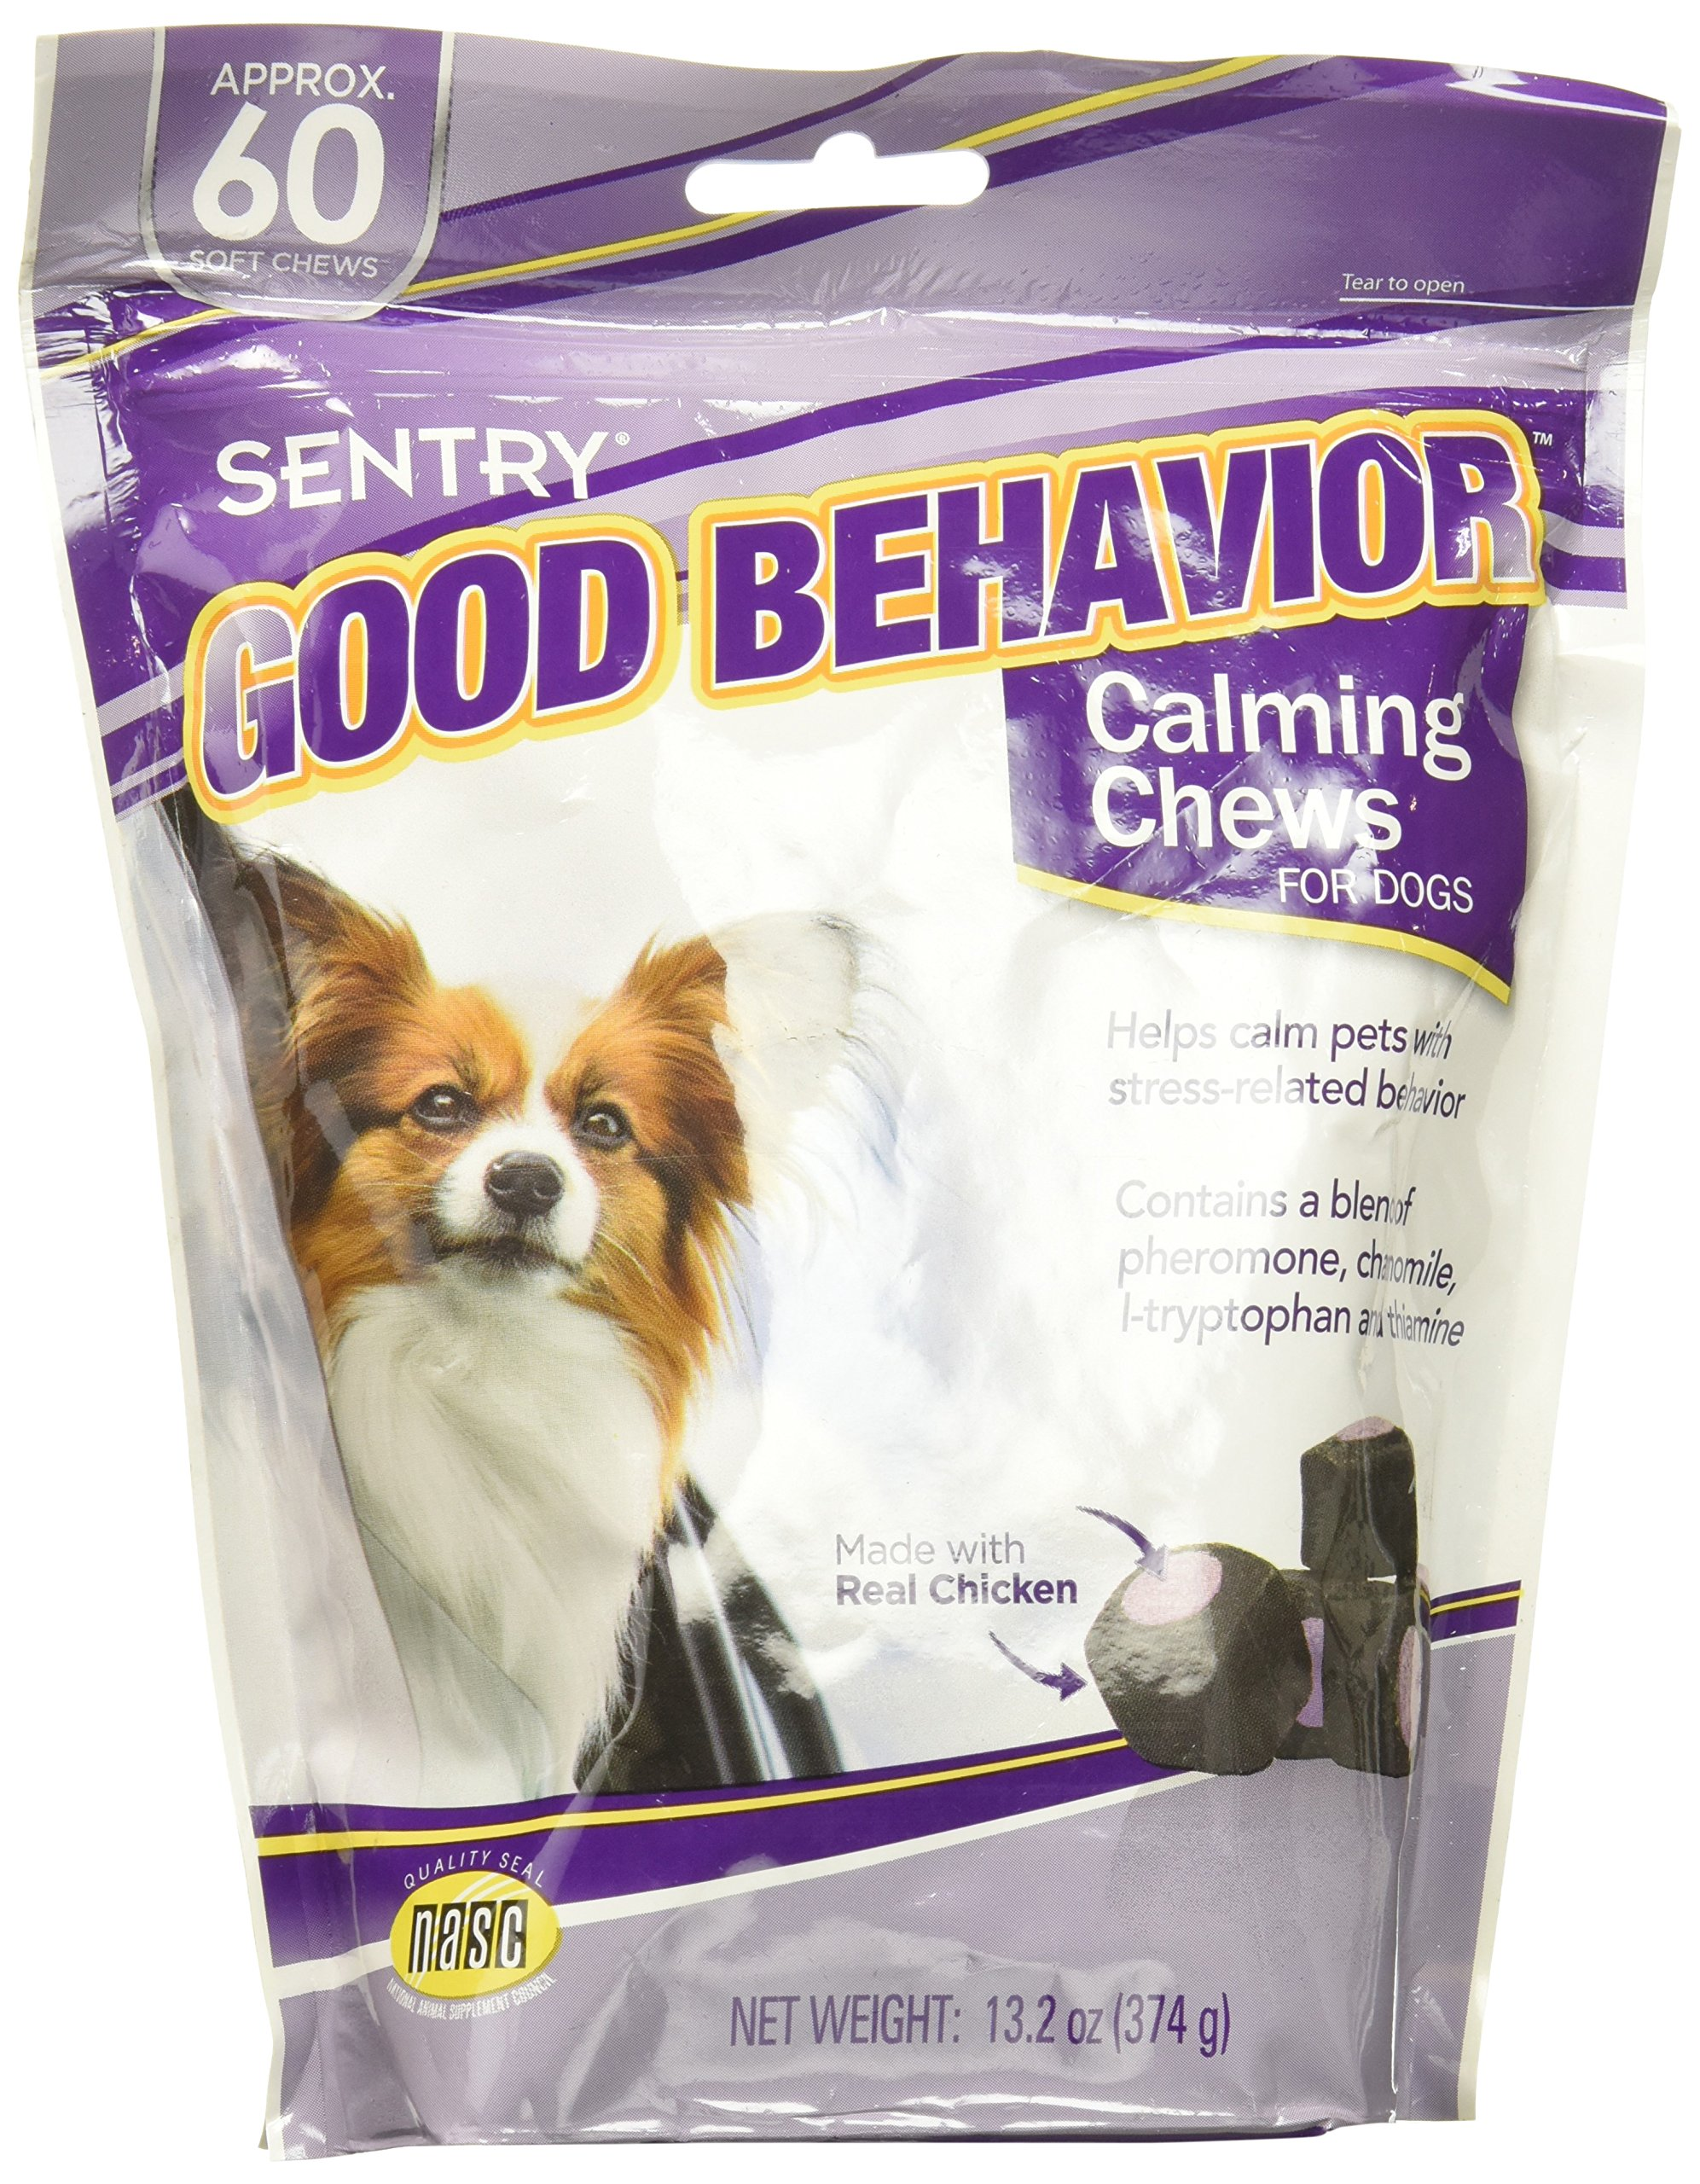 Sergeants Good Behavior Pheromone Technology Calming Dogs 60ct